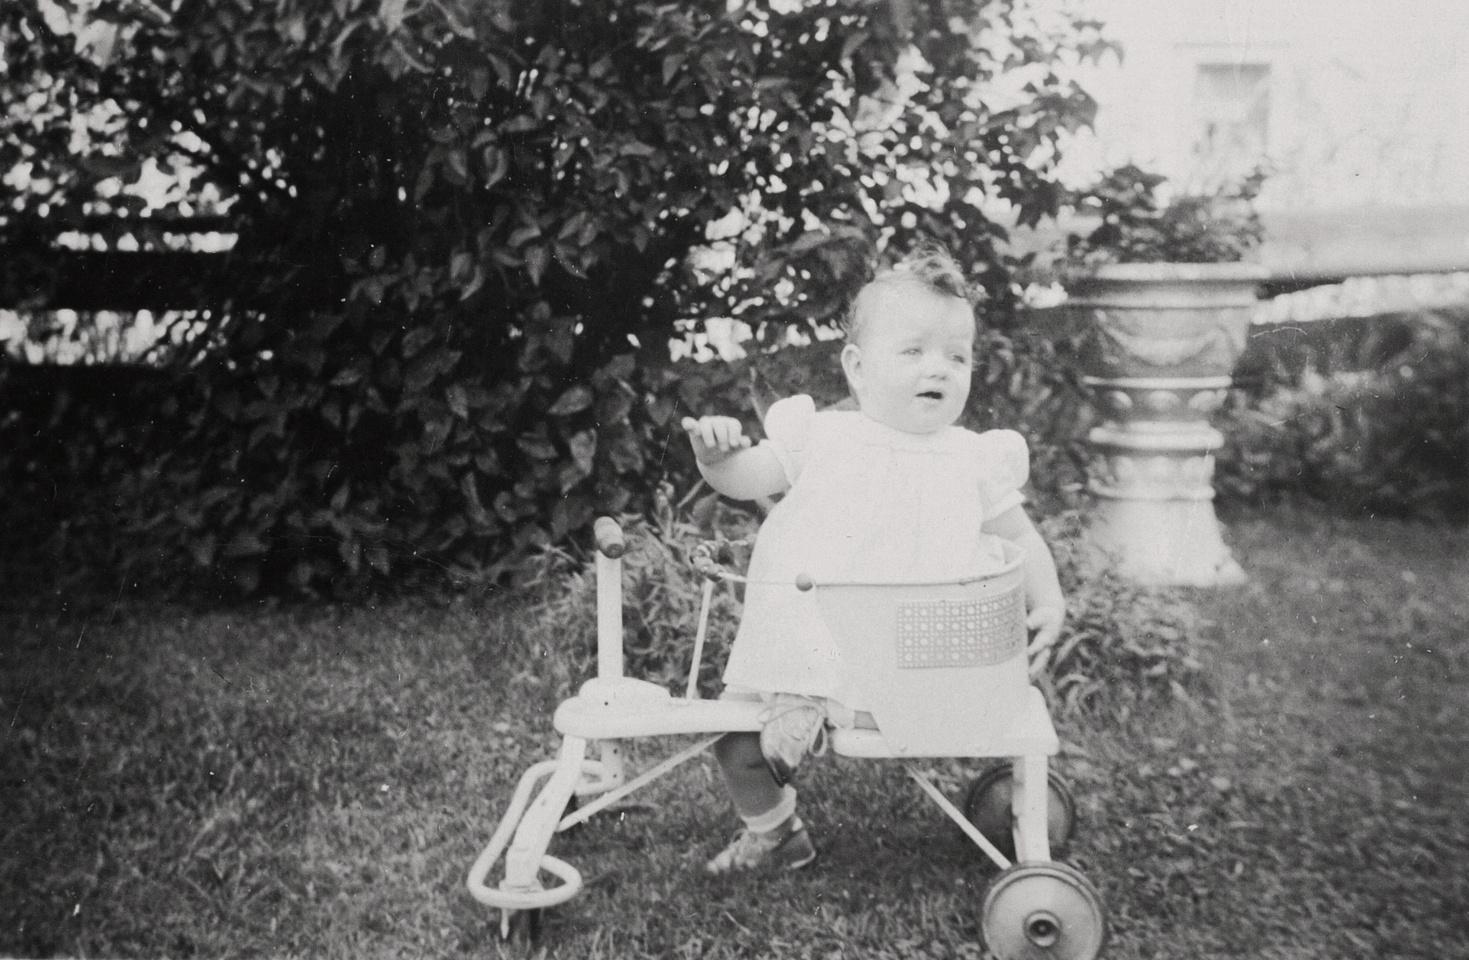 Michelle M. Murosky: The Arthur & Mary Eugenia Collection &emdash; 1944 - Barbara Jean Murosky